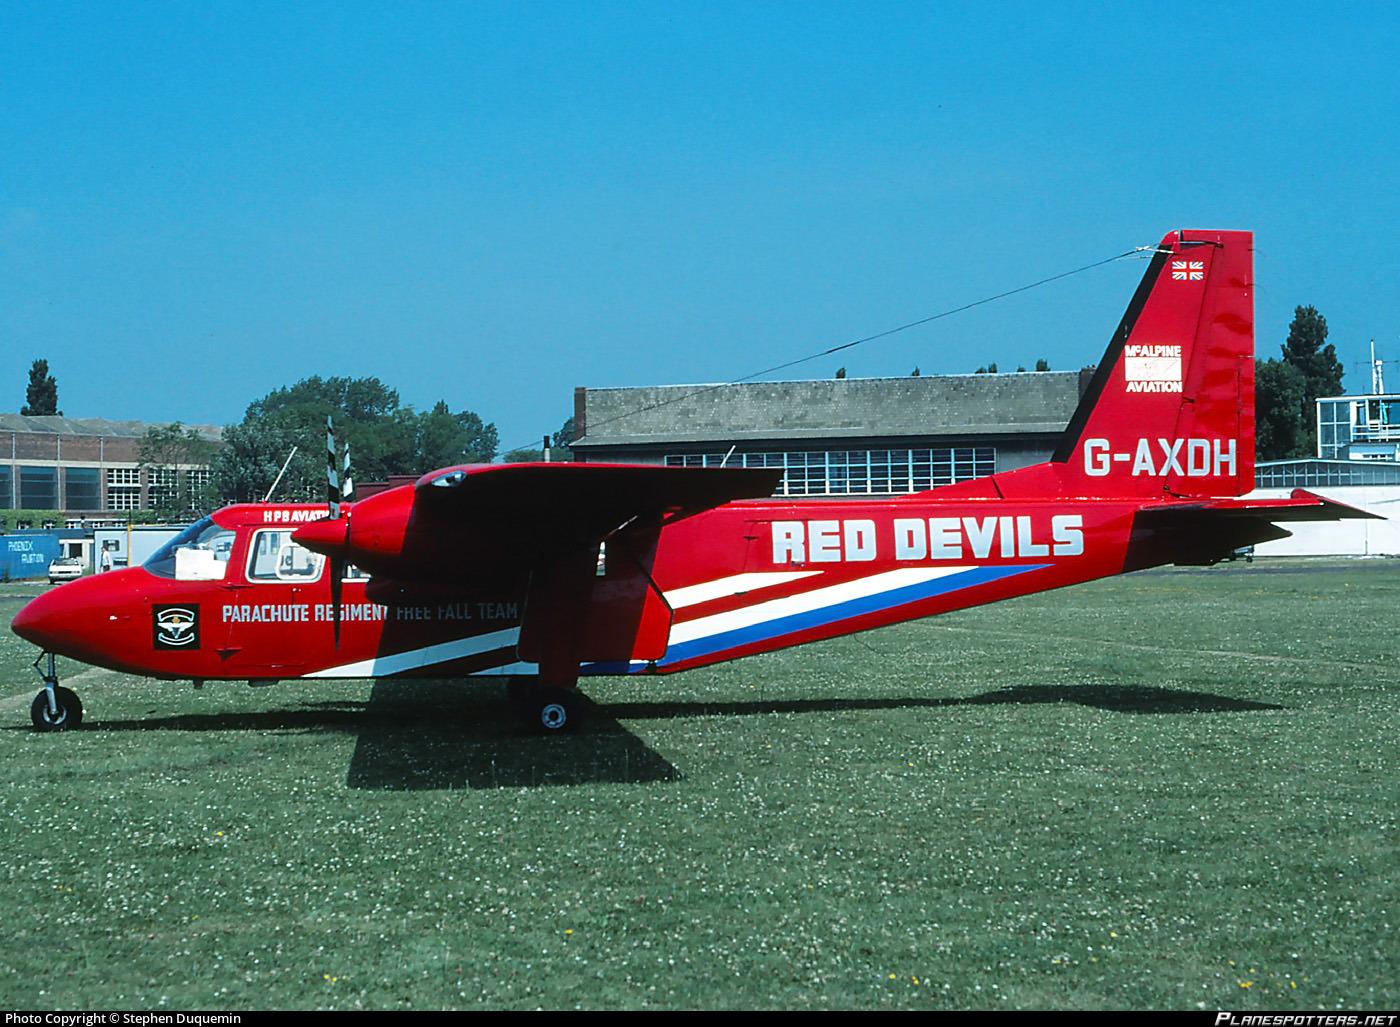 g-axdh-red-devils-parachute-display-team